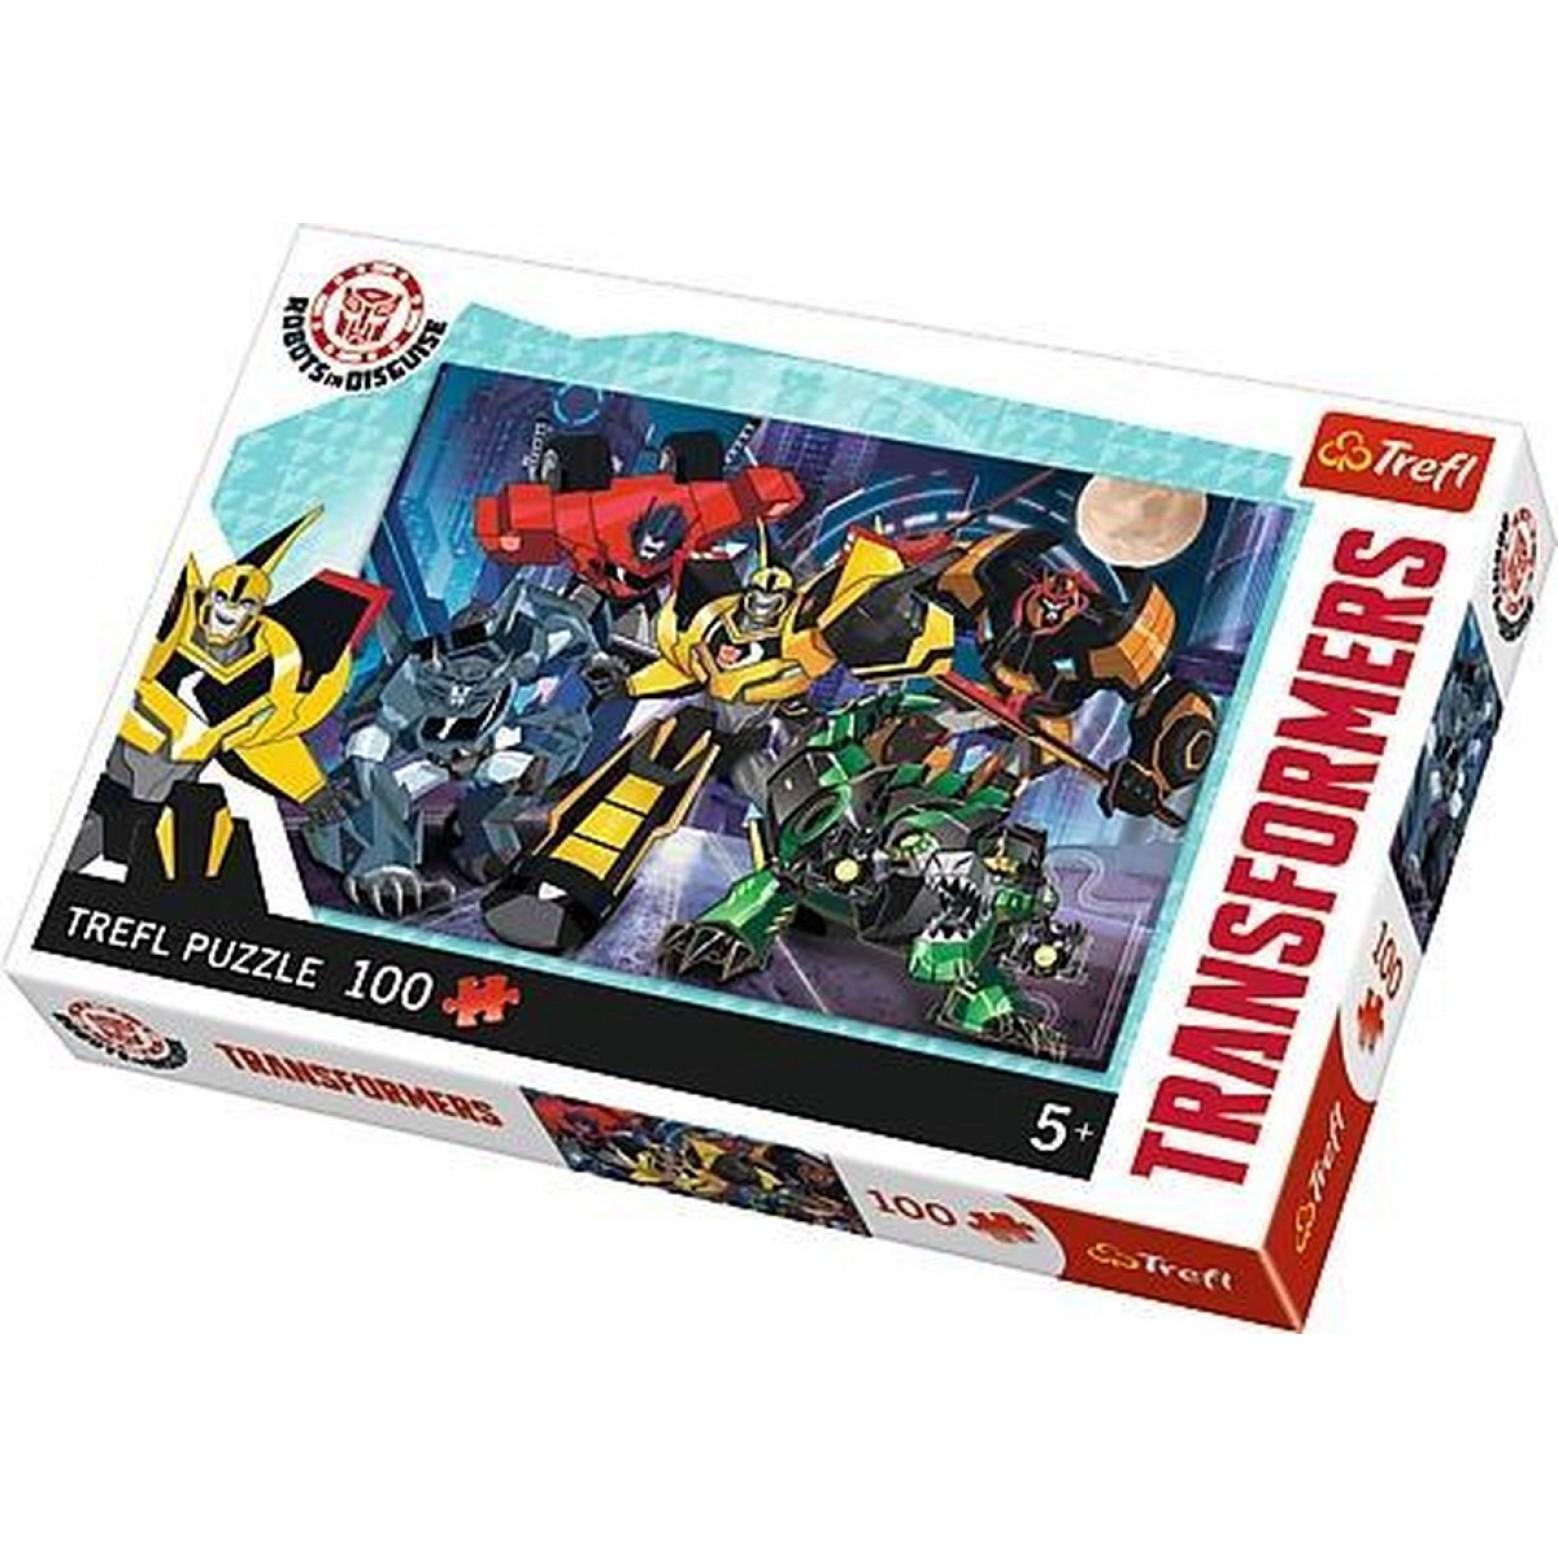 Transformers puzzel 100 stukjes 5+